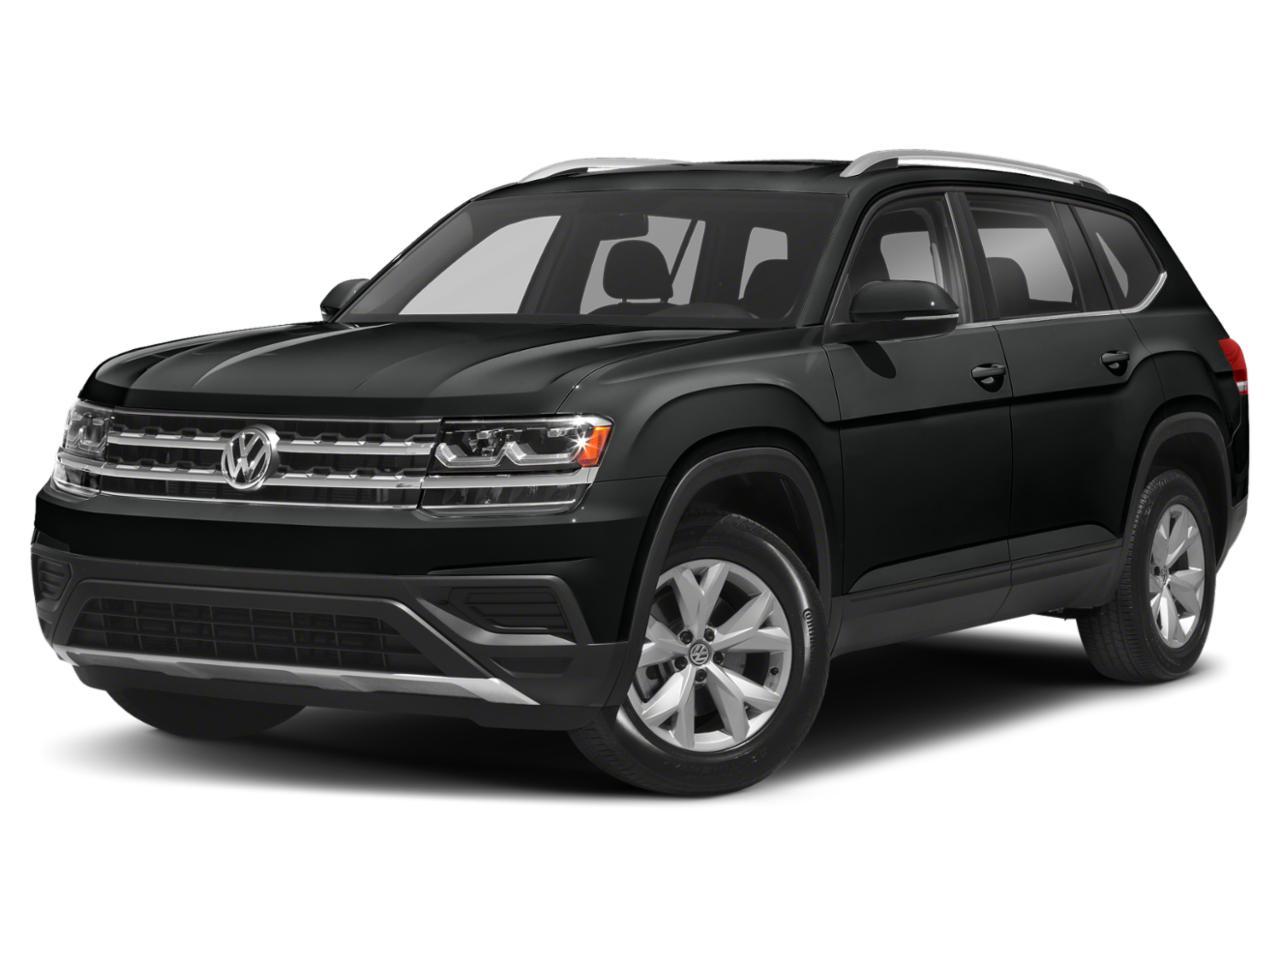 2018 Volkswagen Atlas Vehicle Photo in Plainfield, IL 60586